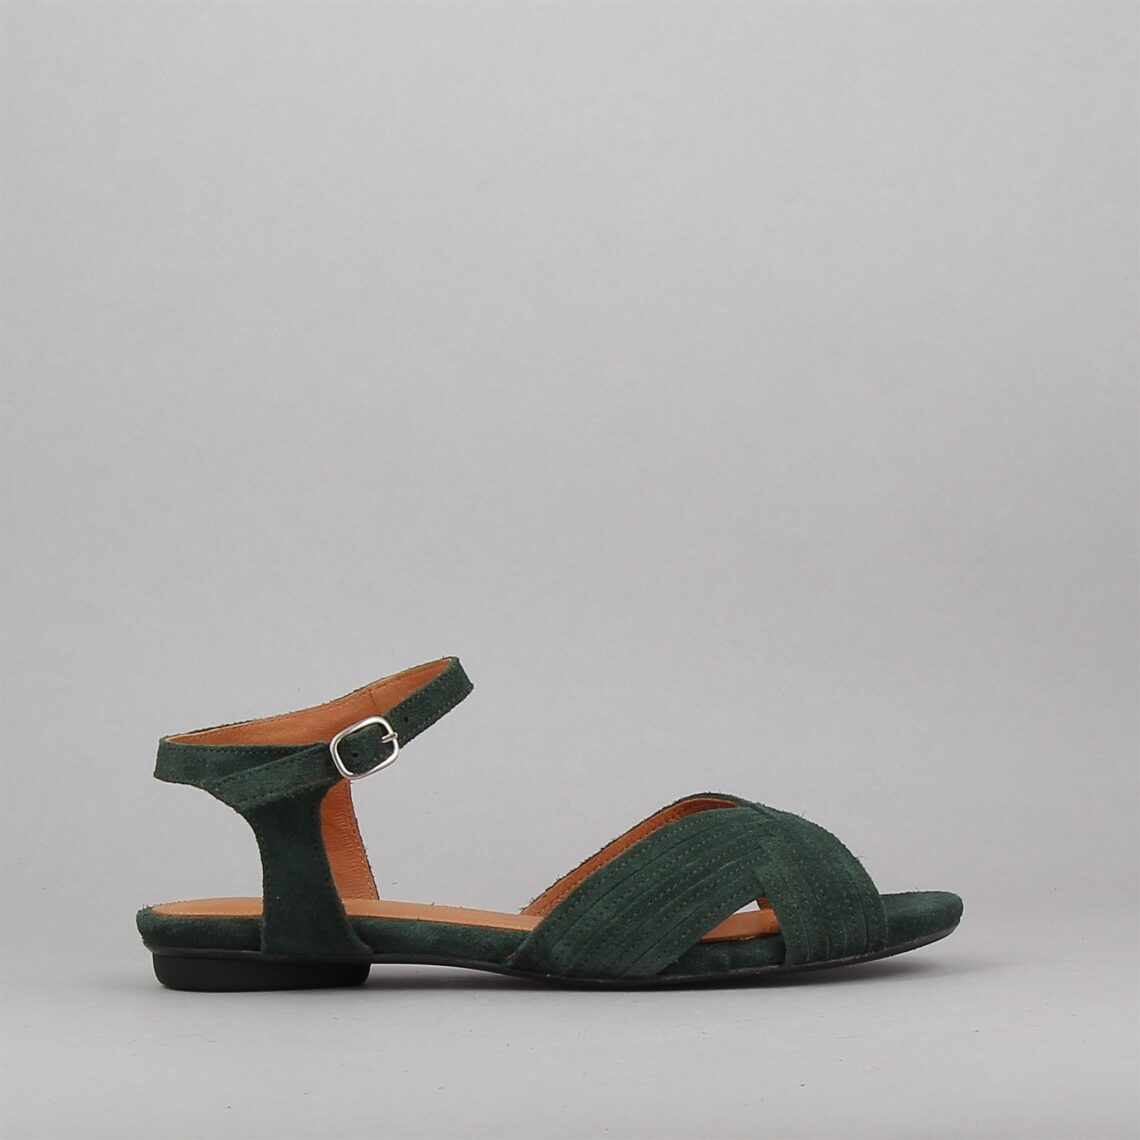 niabi-kaki-169394178-0.jpg